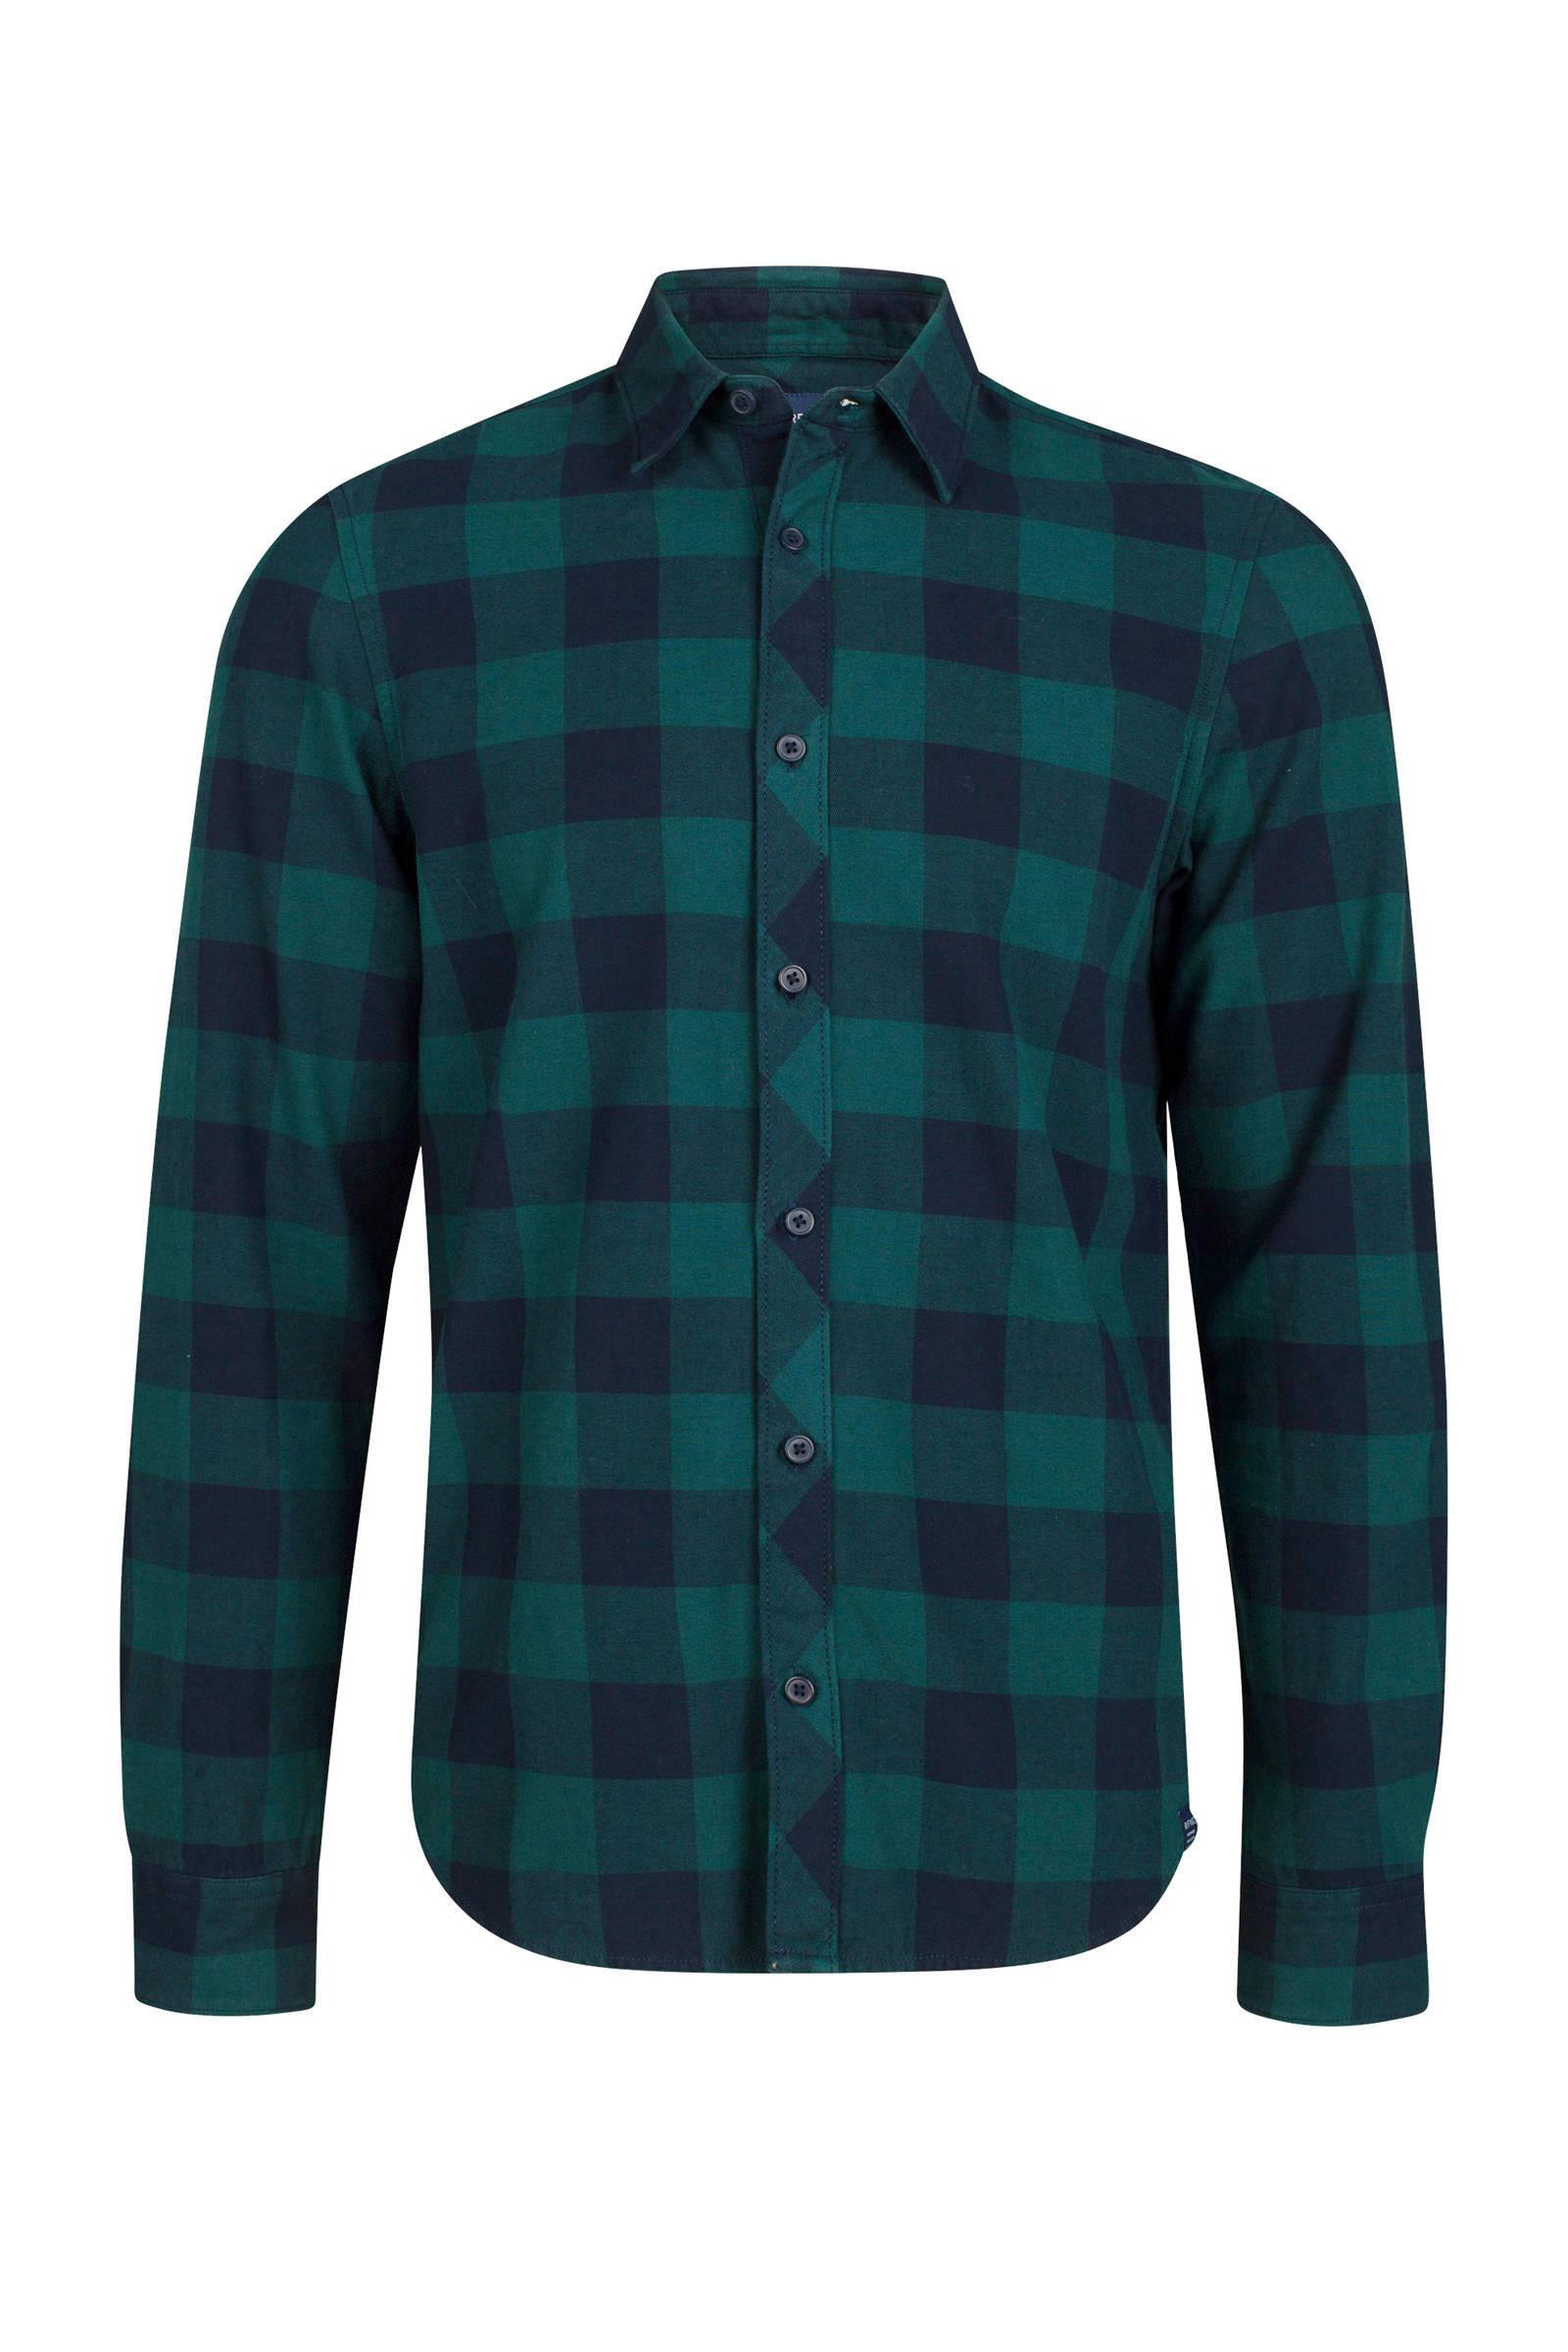 Donkergroen Overhemd.We Fashion Geblokt Slim Fit Overhemd Groen Wehkamp